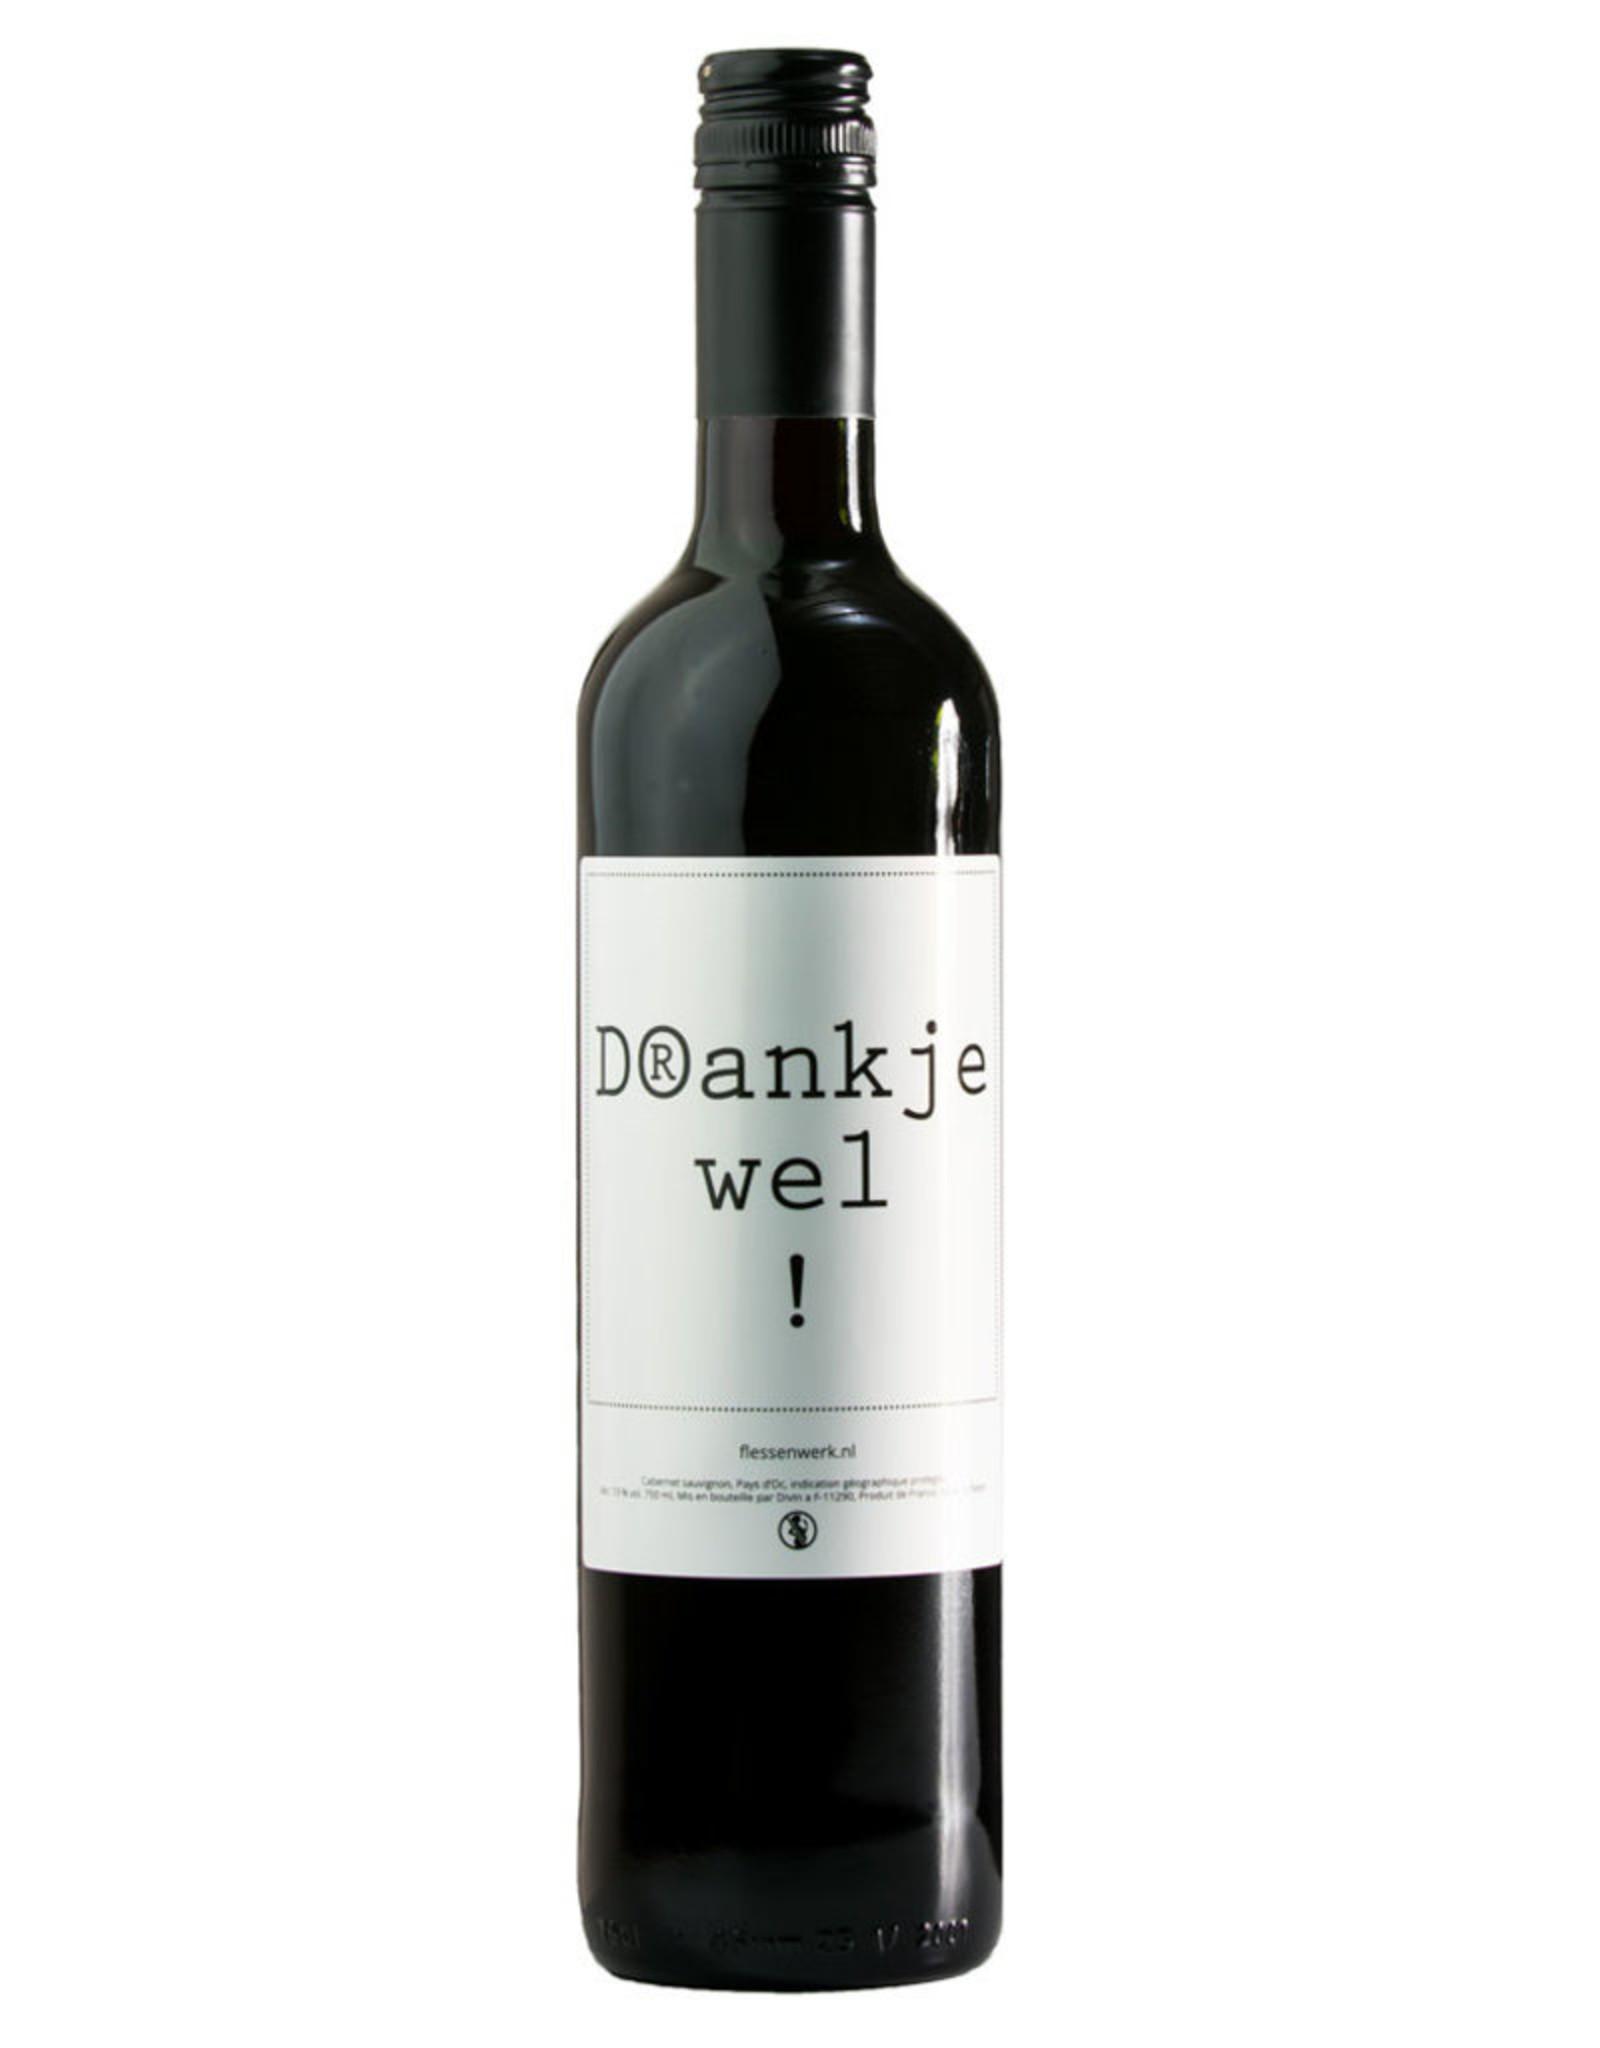 Flessenwerk Drankjewel wijn